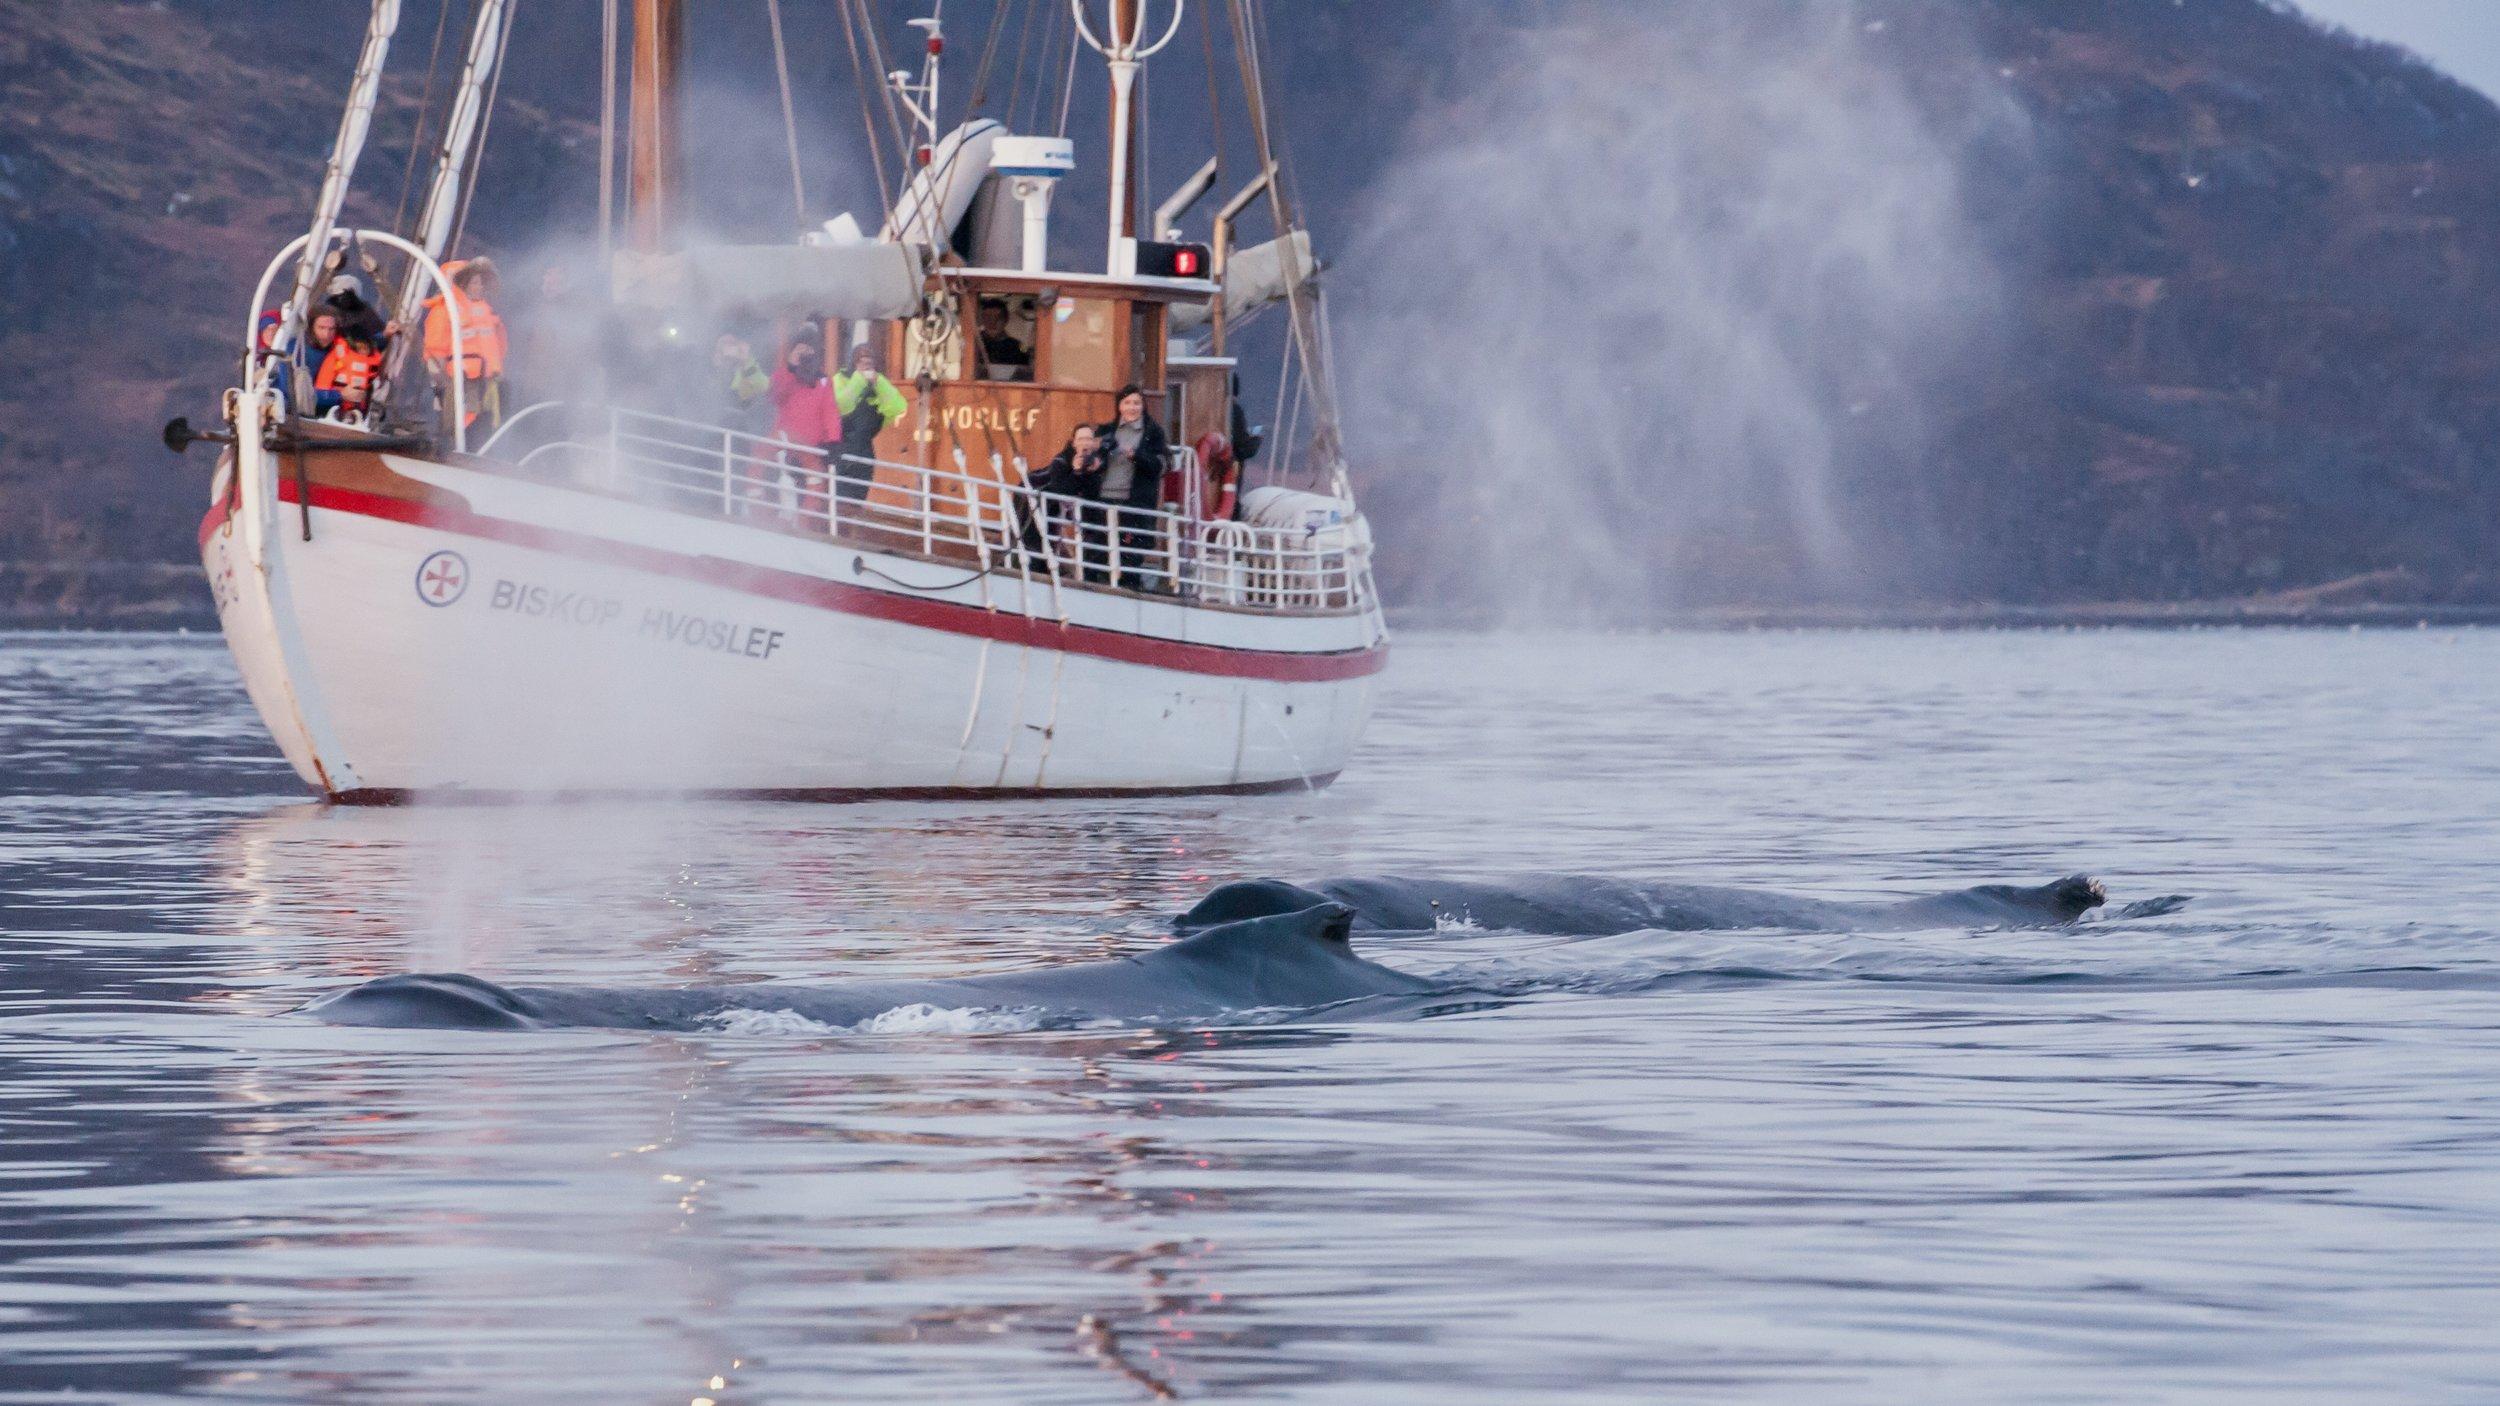 20141128 Whale watching boat-21.jpg